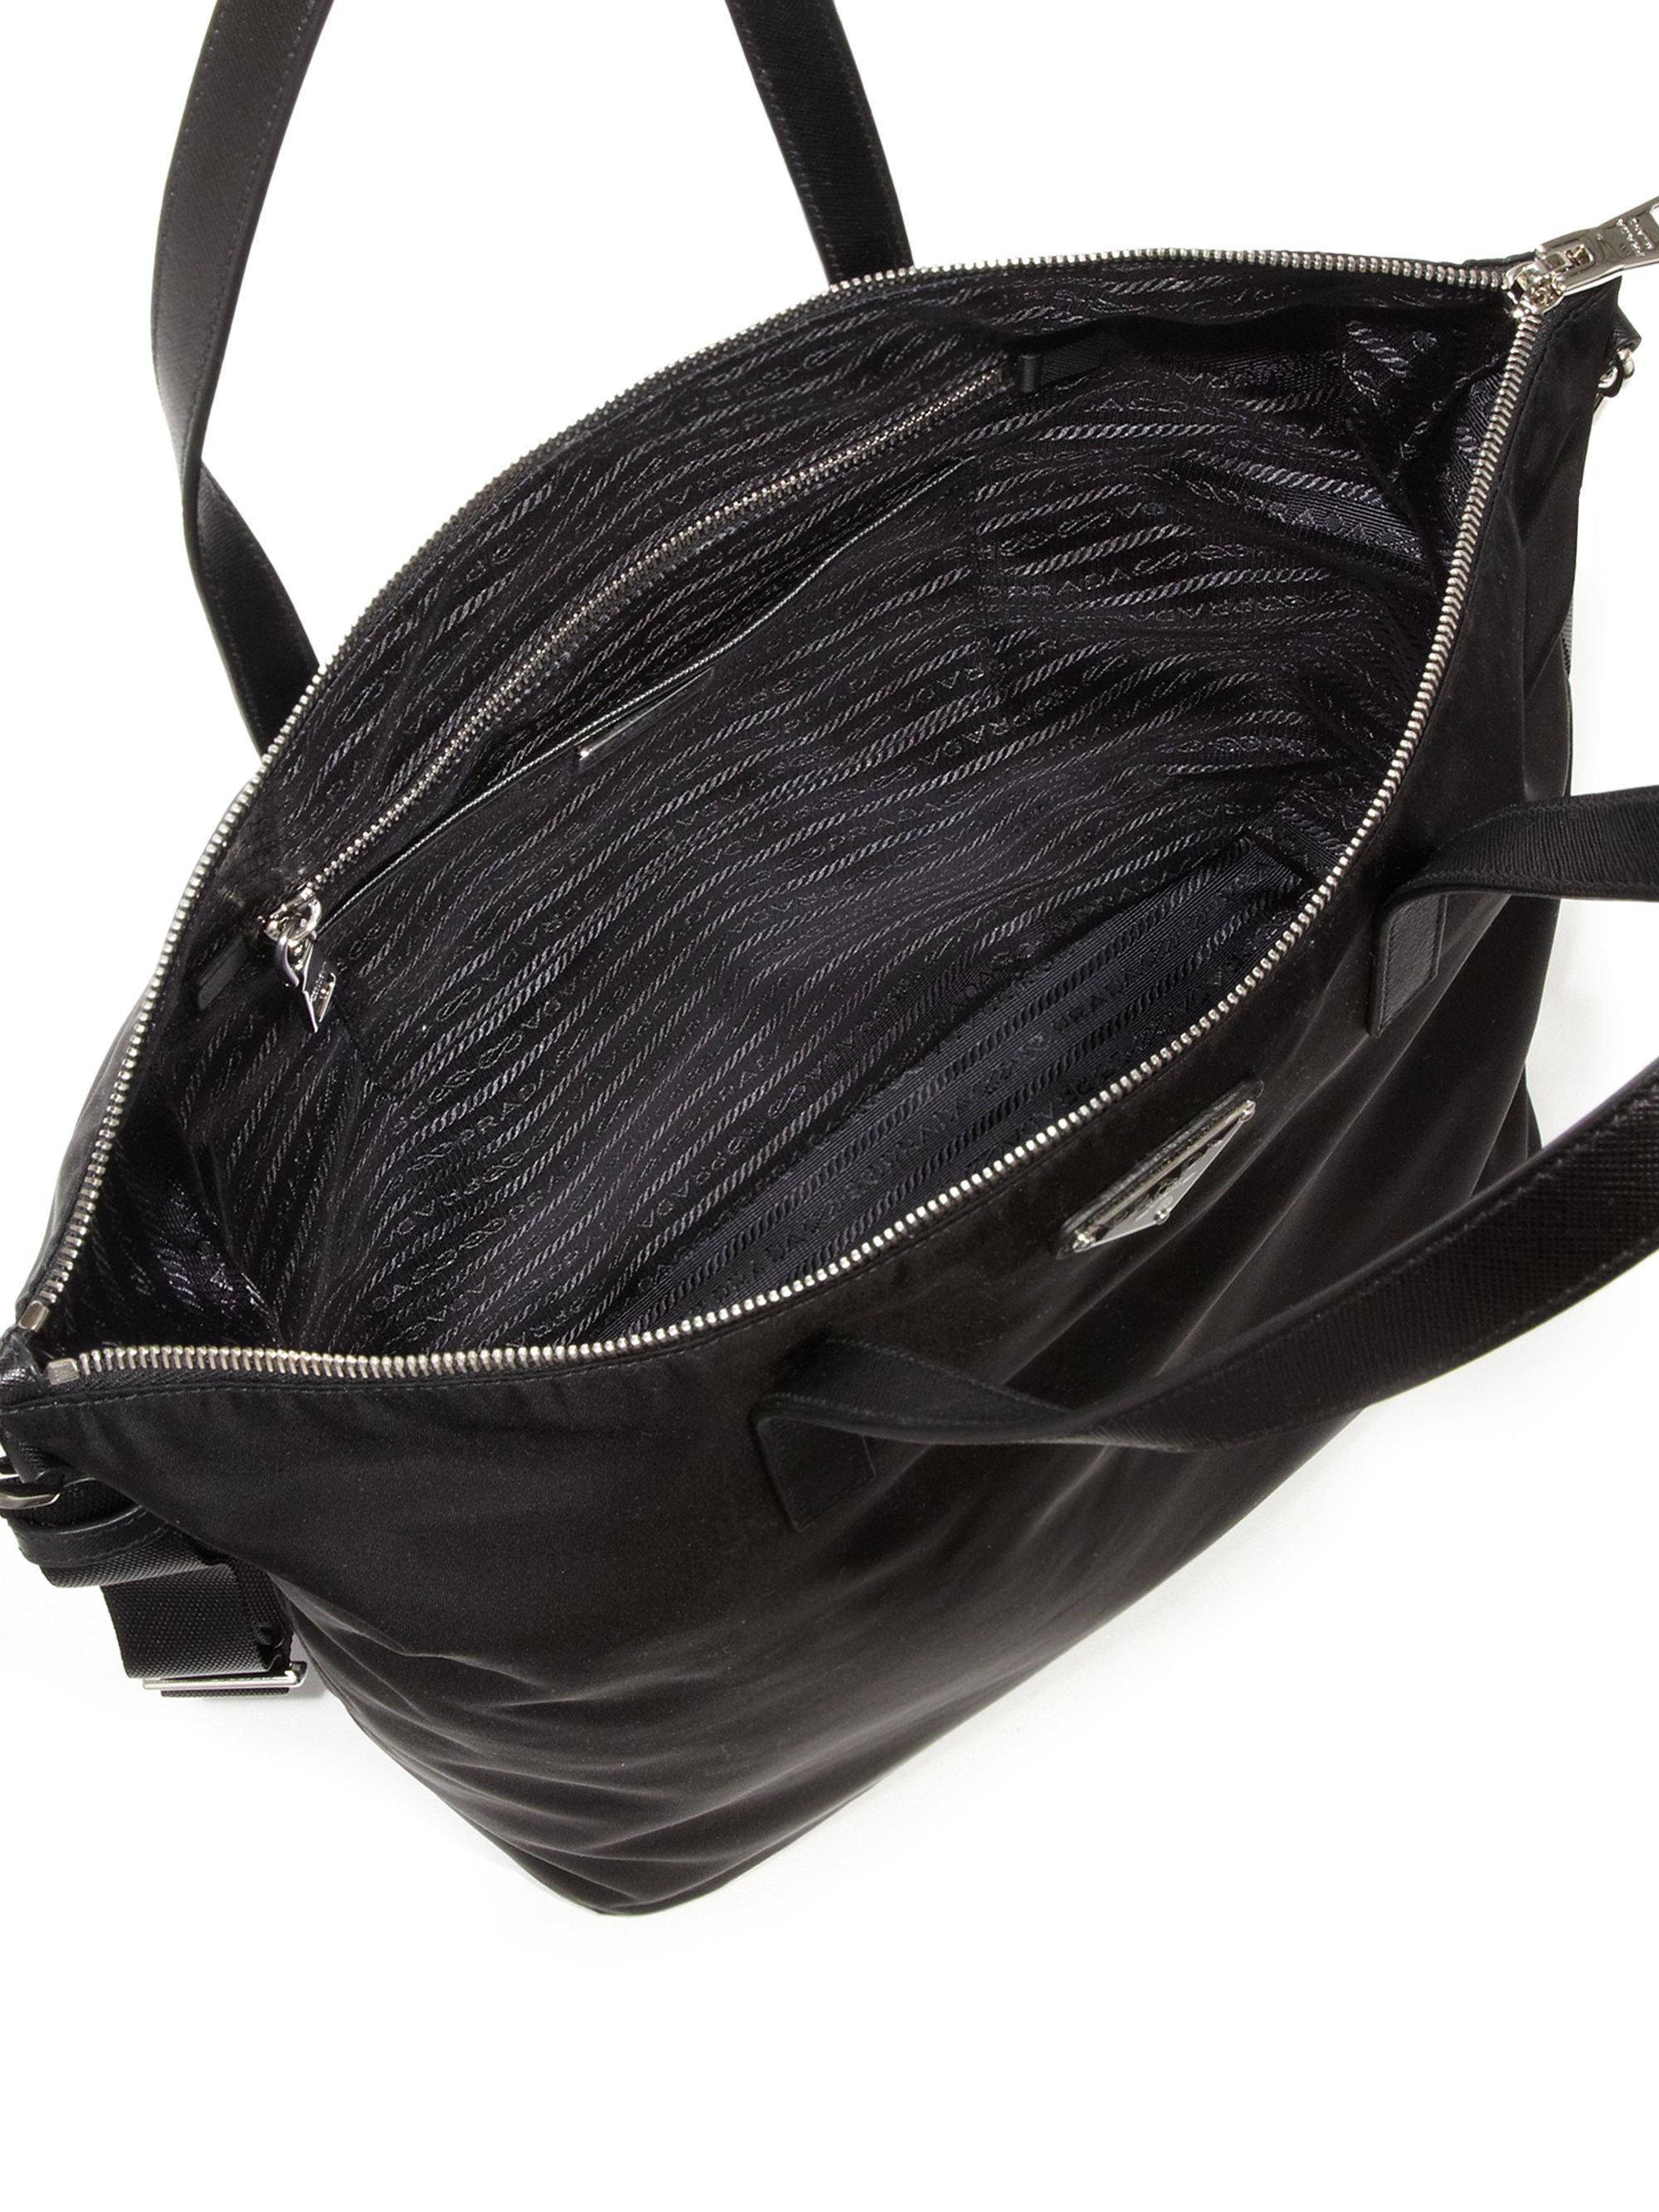 666238a3bd68 Lyst - Prada Nylon   Leather Zip Tote in Black